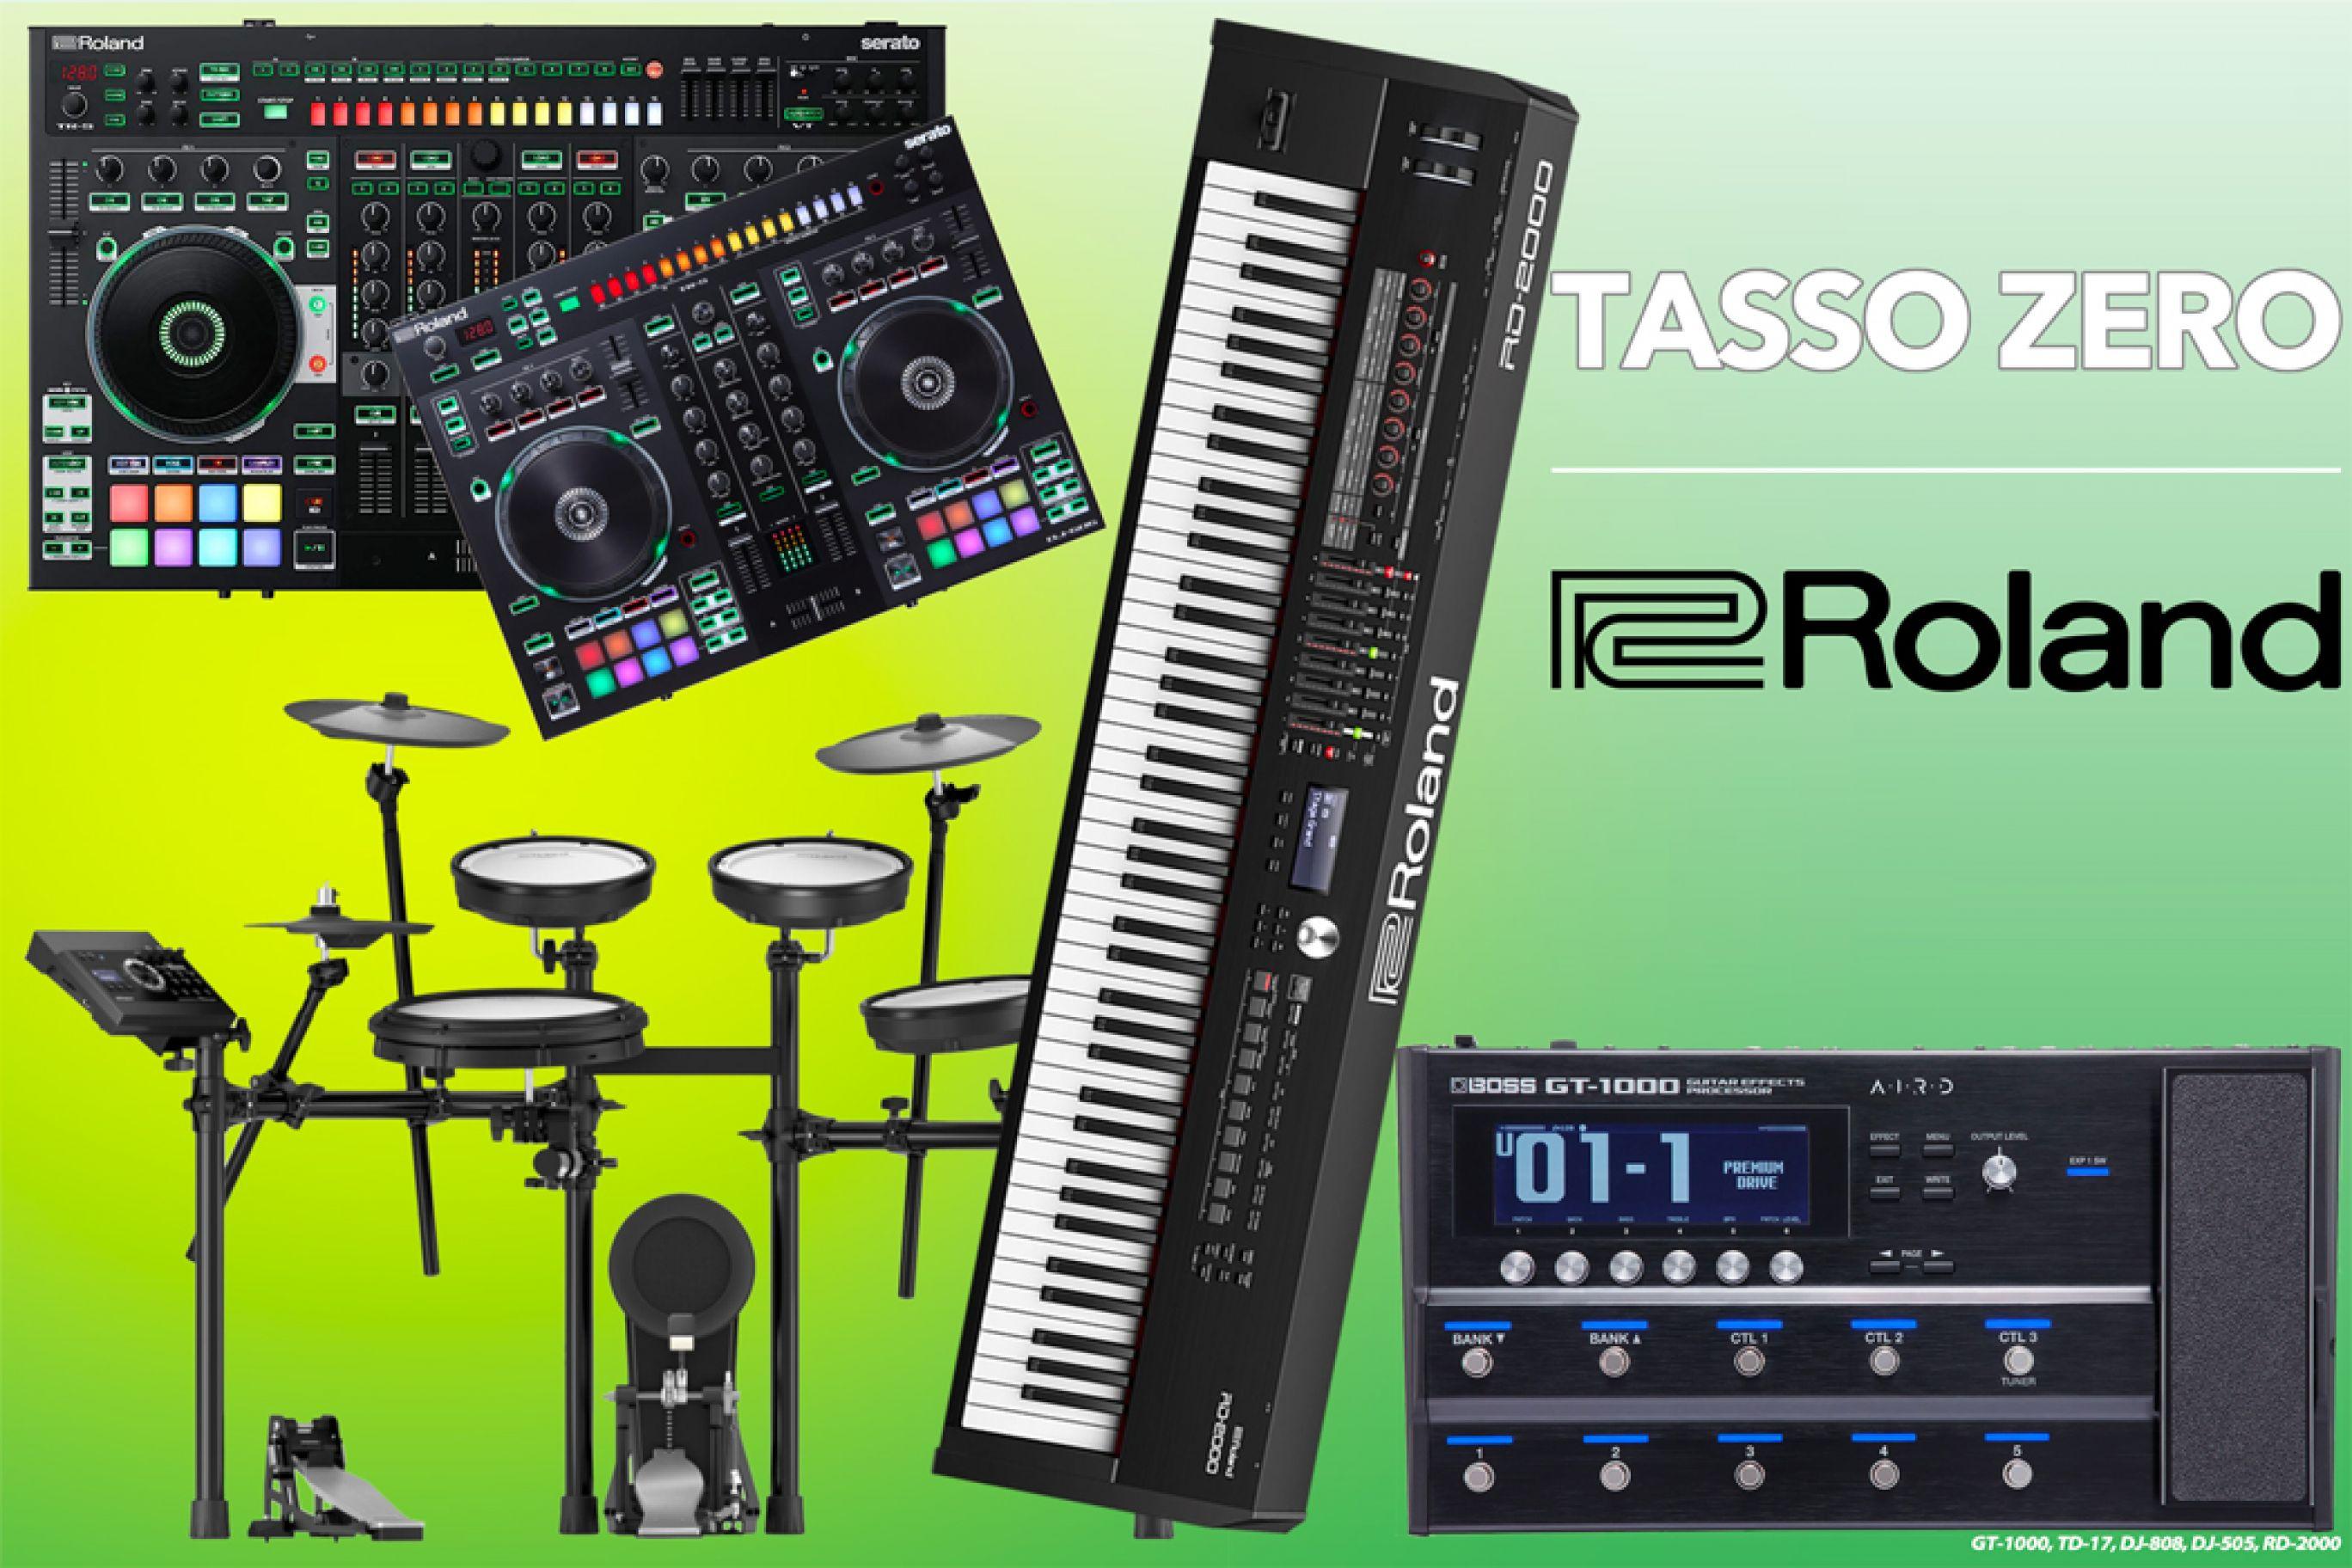 Roland Tasso Zero 2020